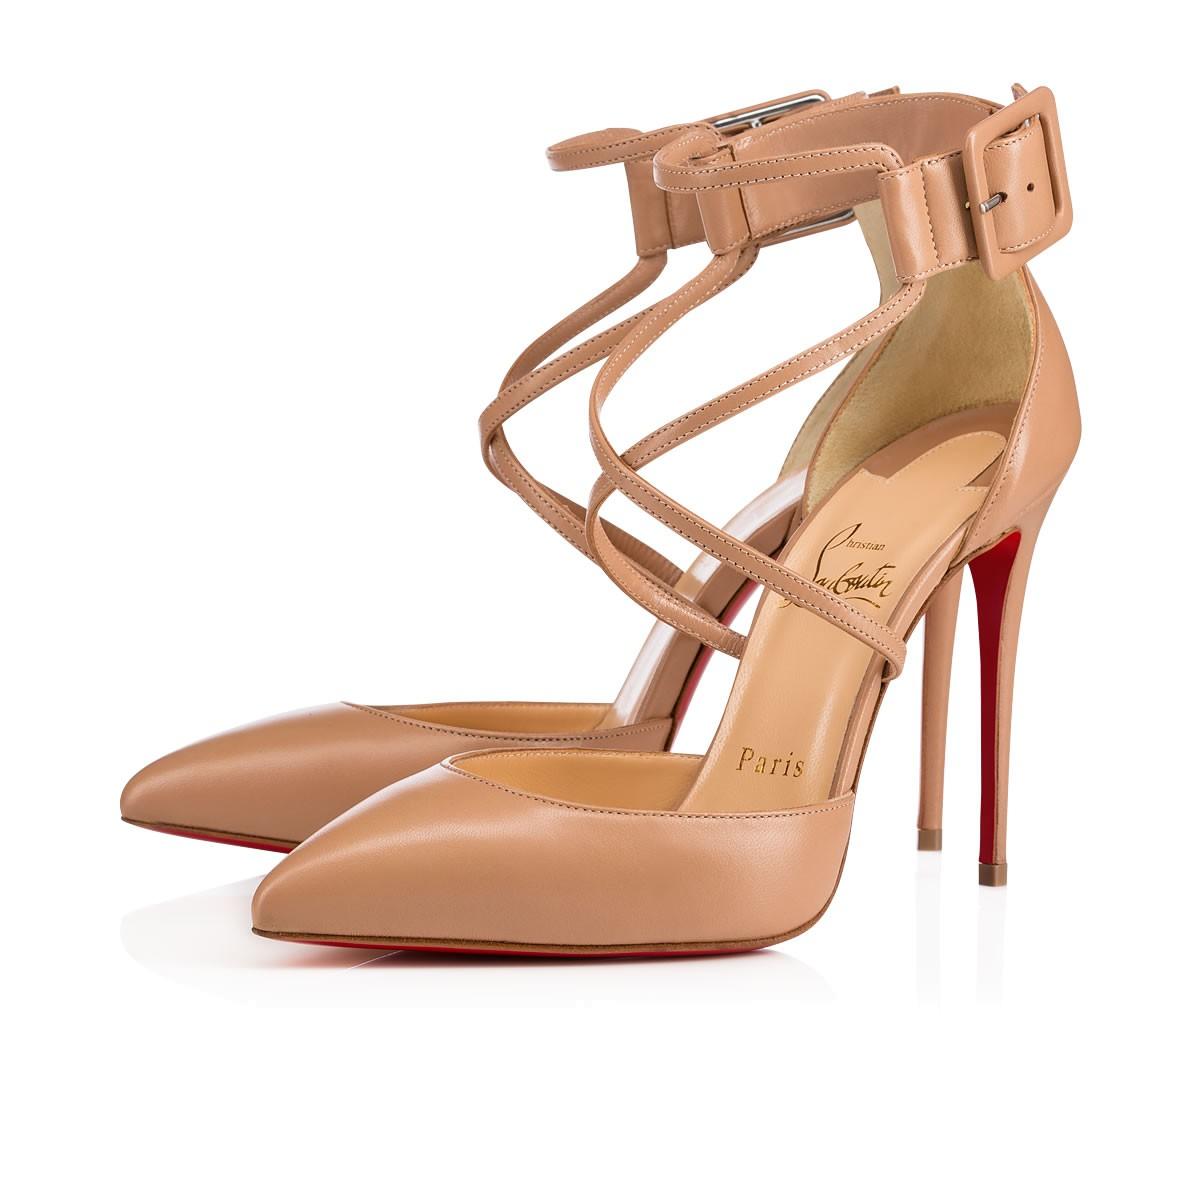 the best attitude 2f9a3 cf4eb Suzanna 100 NUDE Nappa - Women Shoes - Christian Louboutin